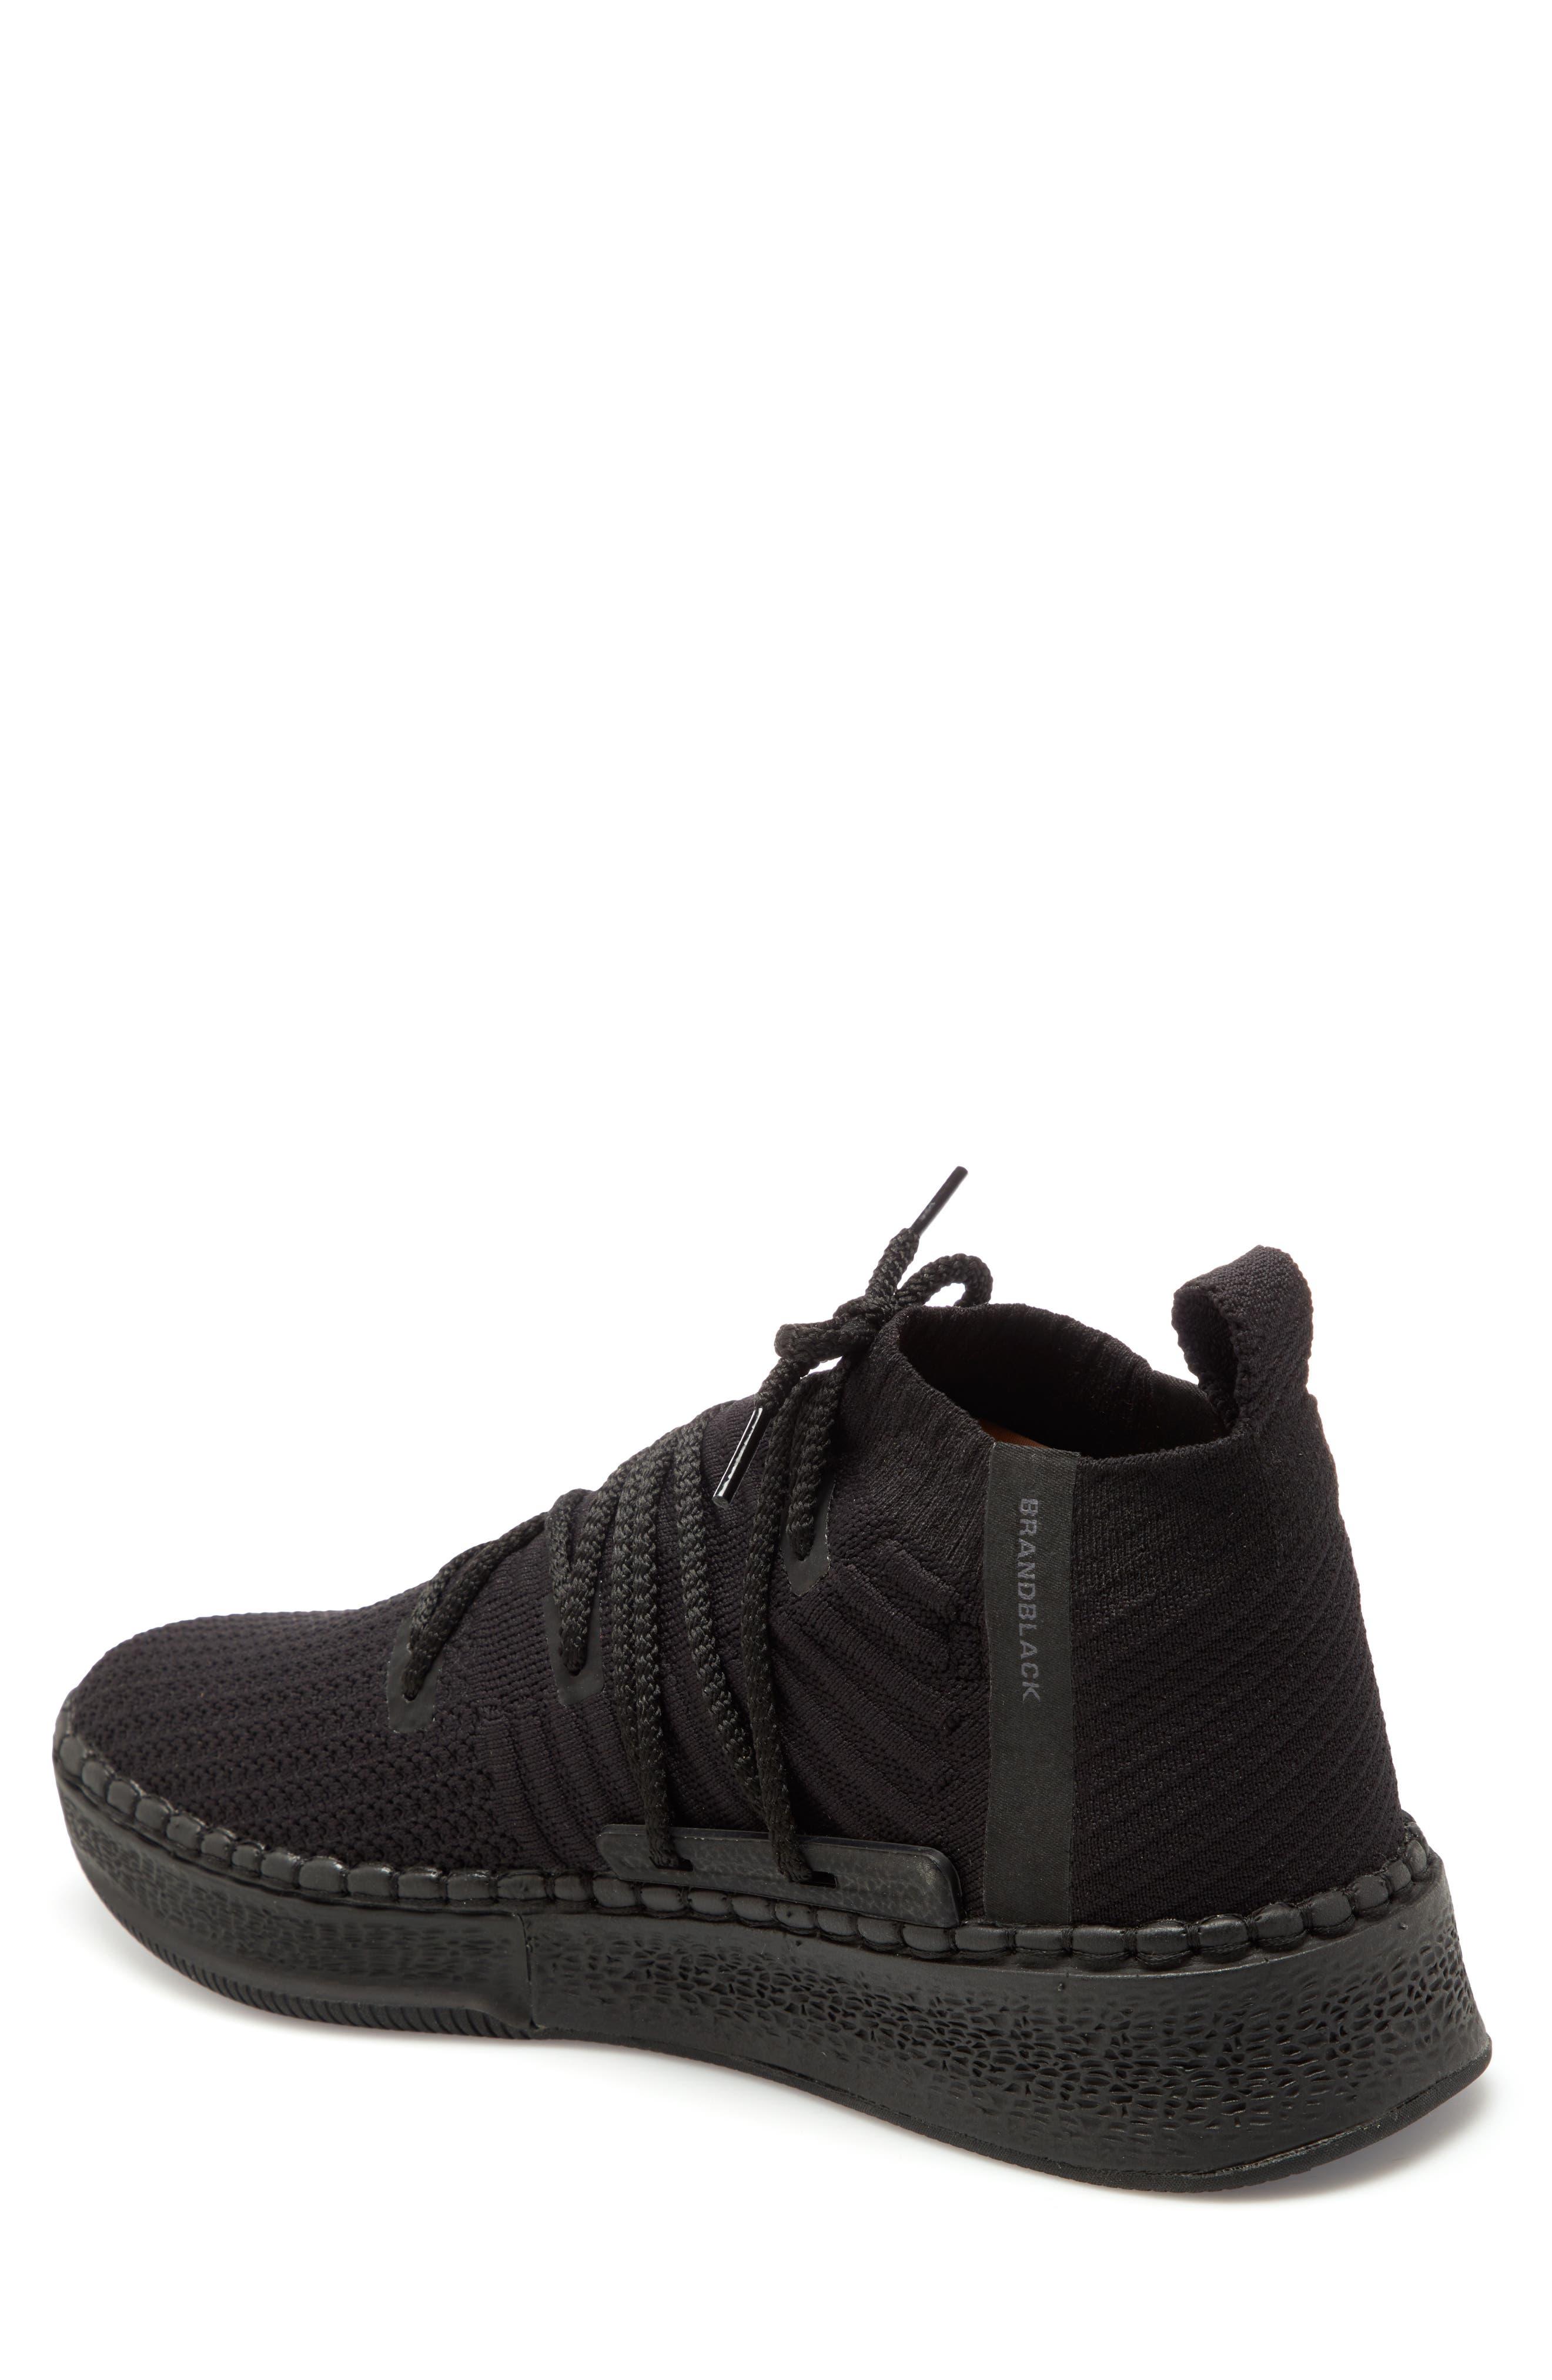 Delta Sneaker,                             Alternate thumbnail 4, color,